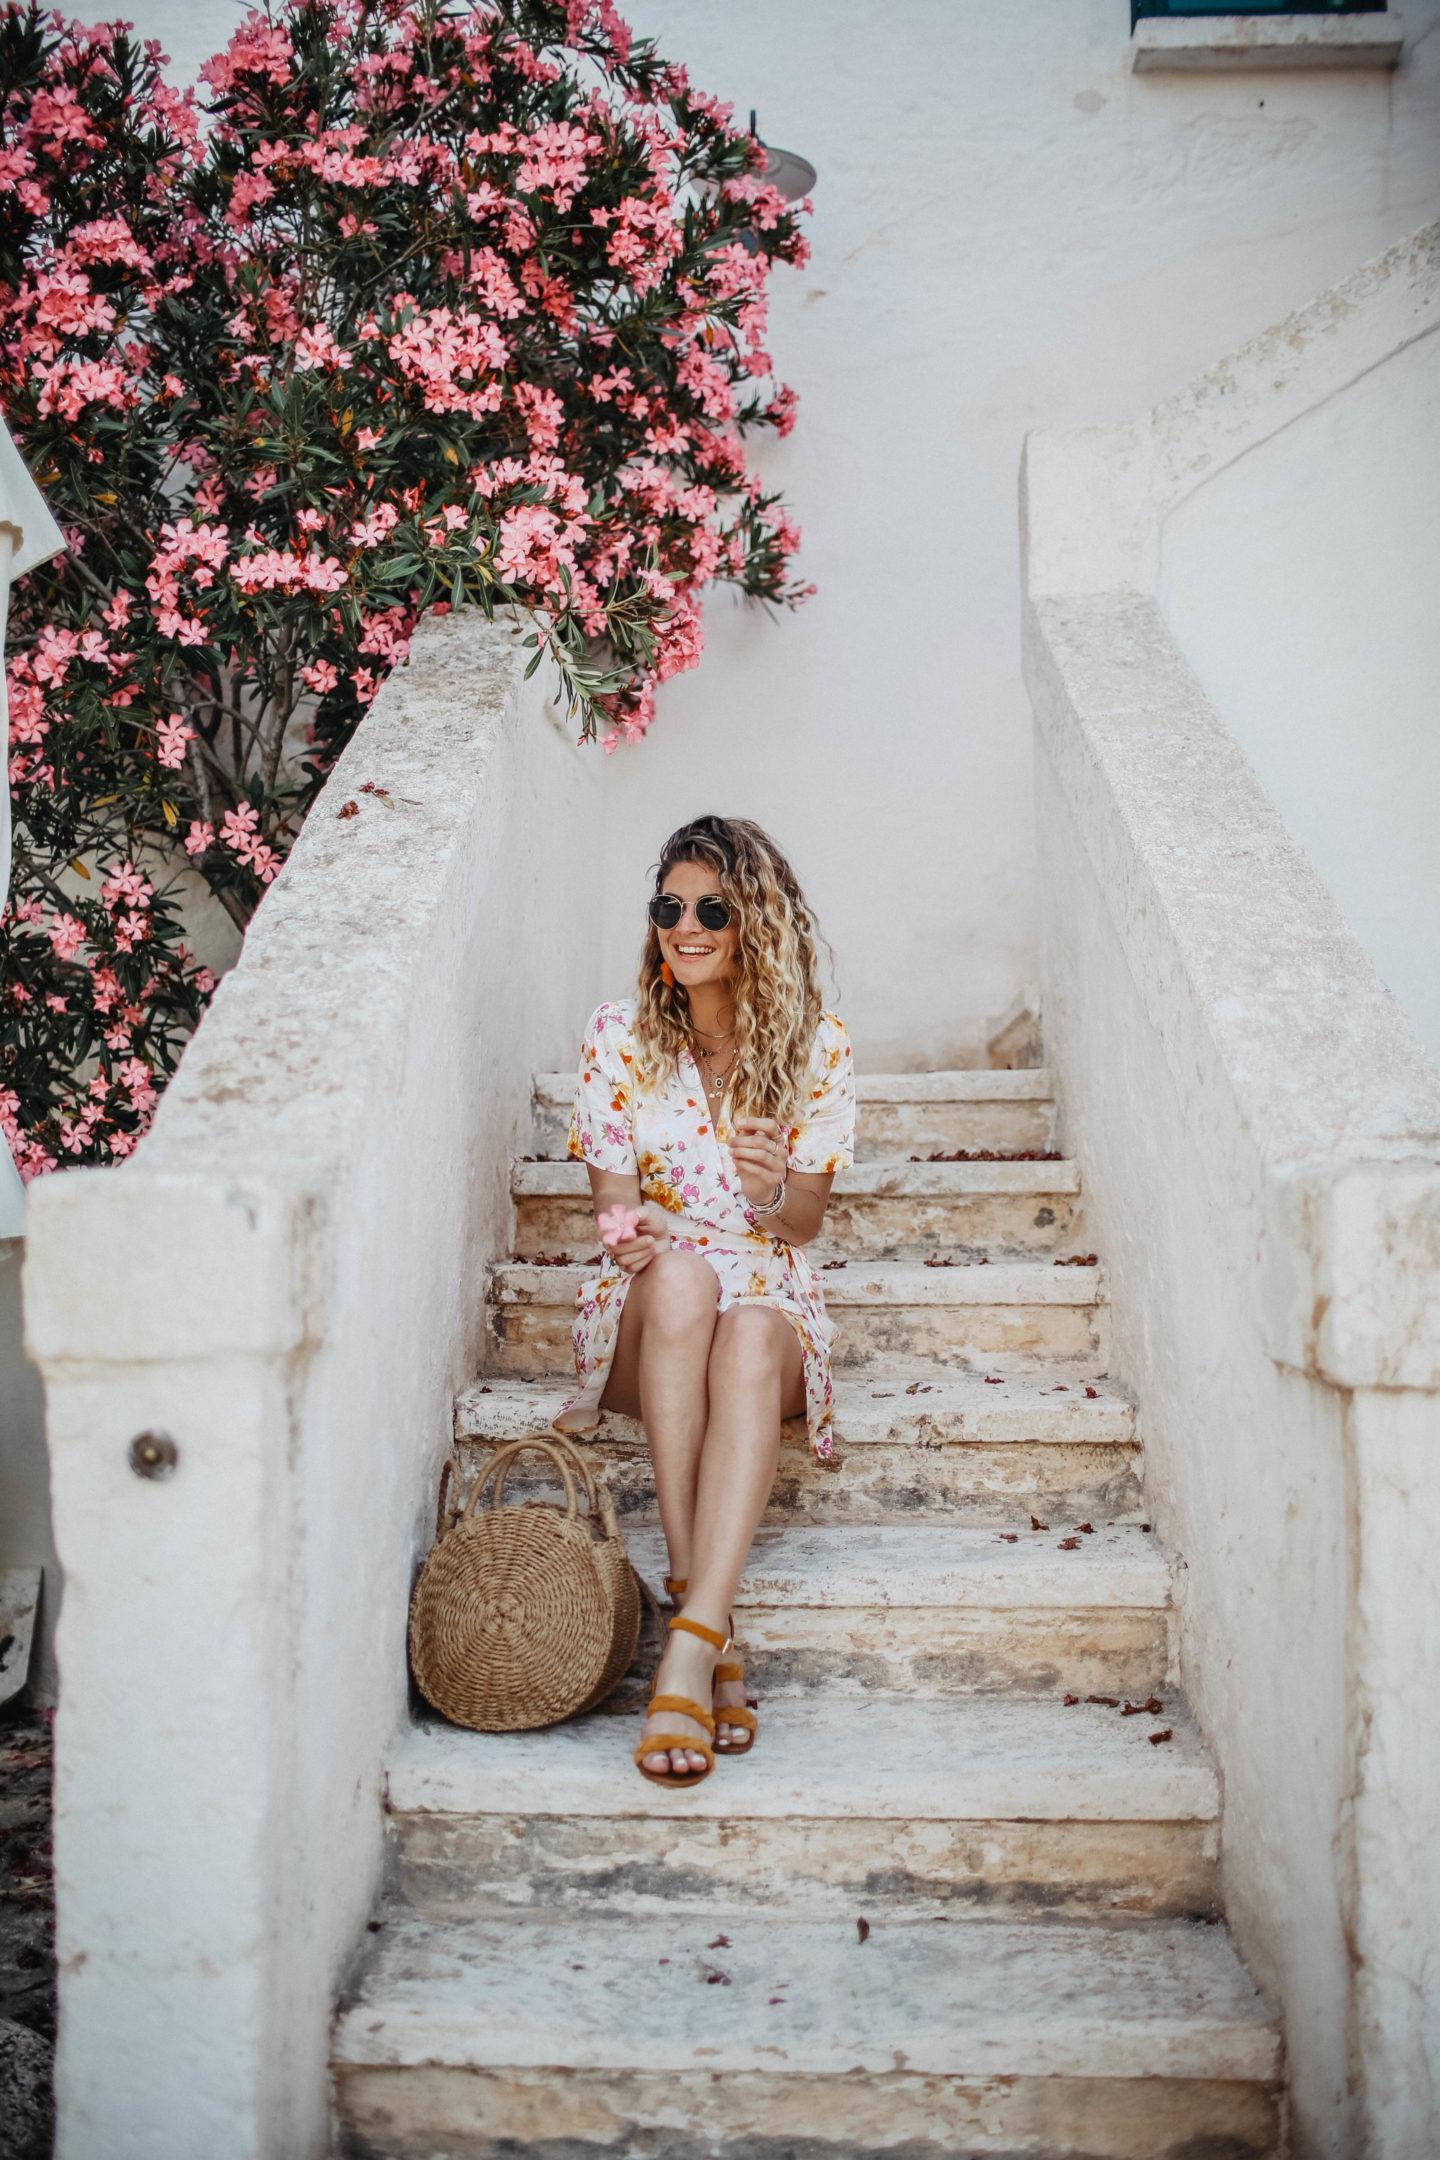 Idée look printemps femme marie and mood blog